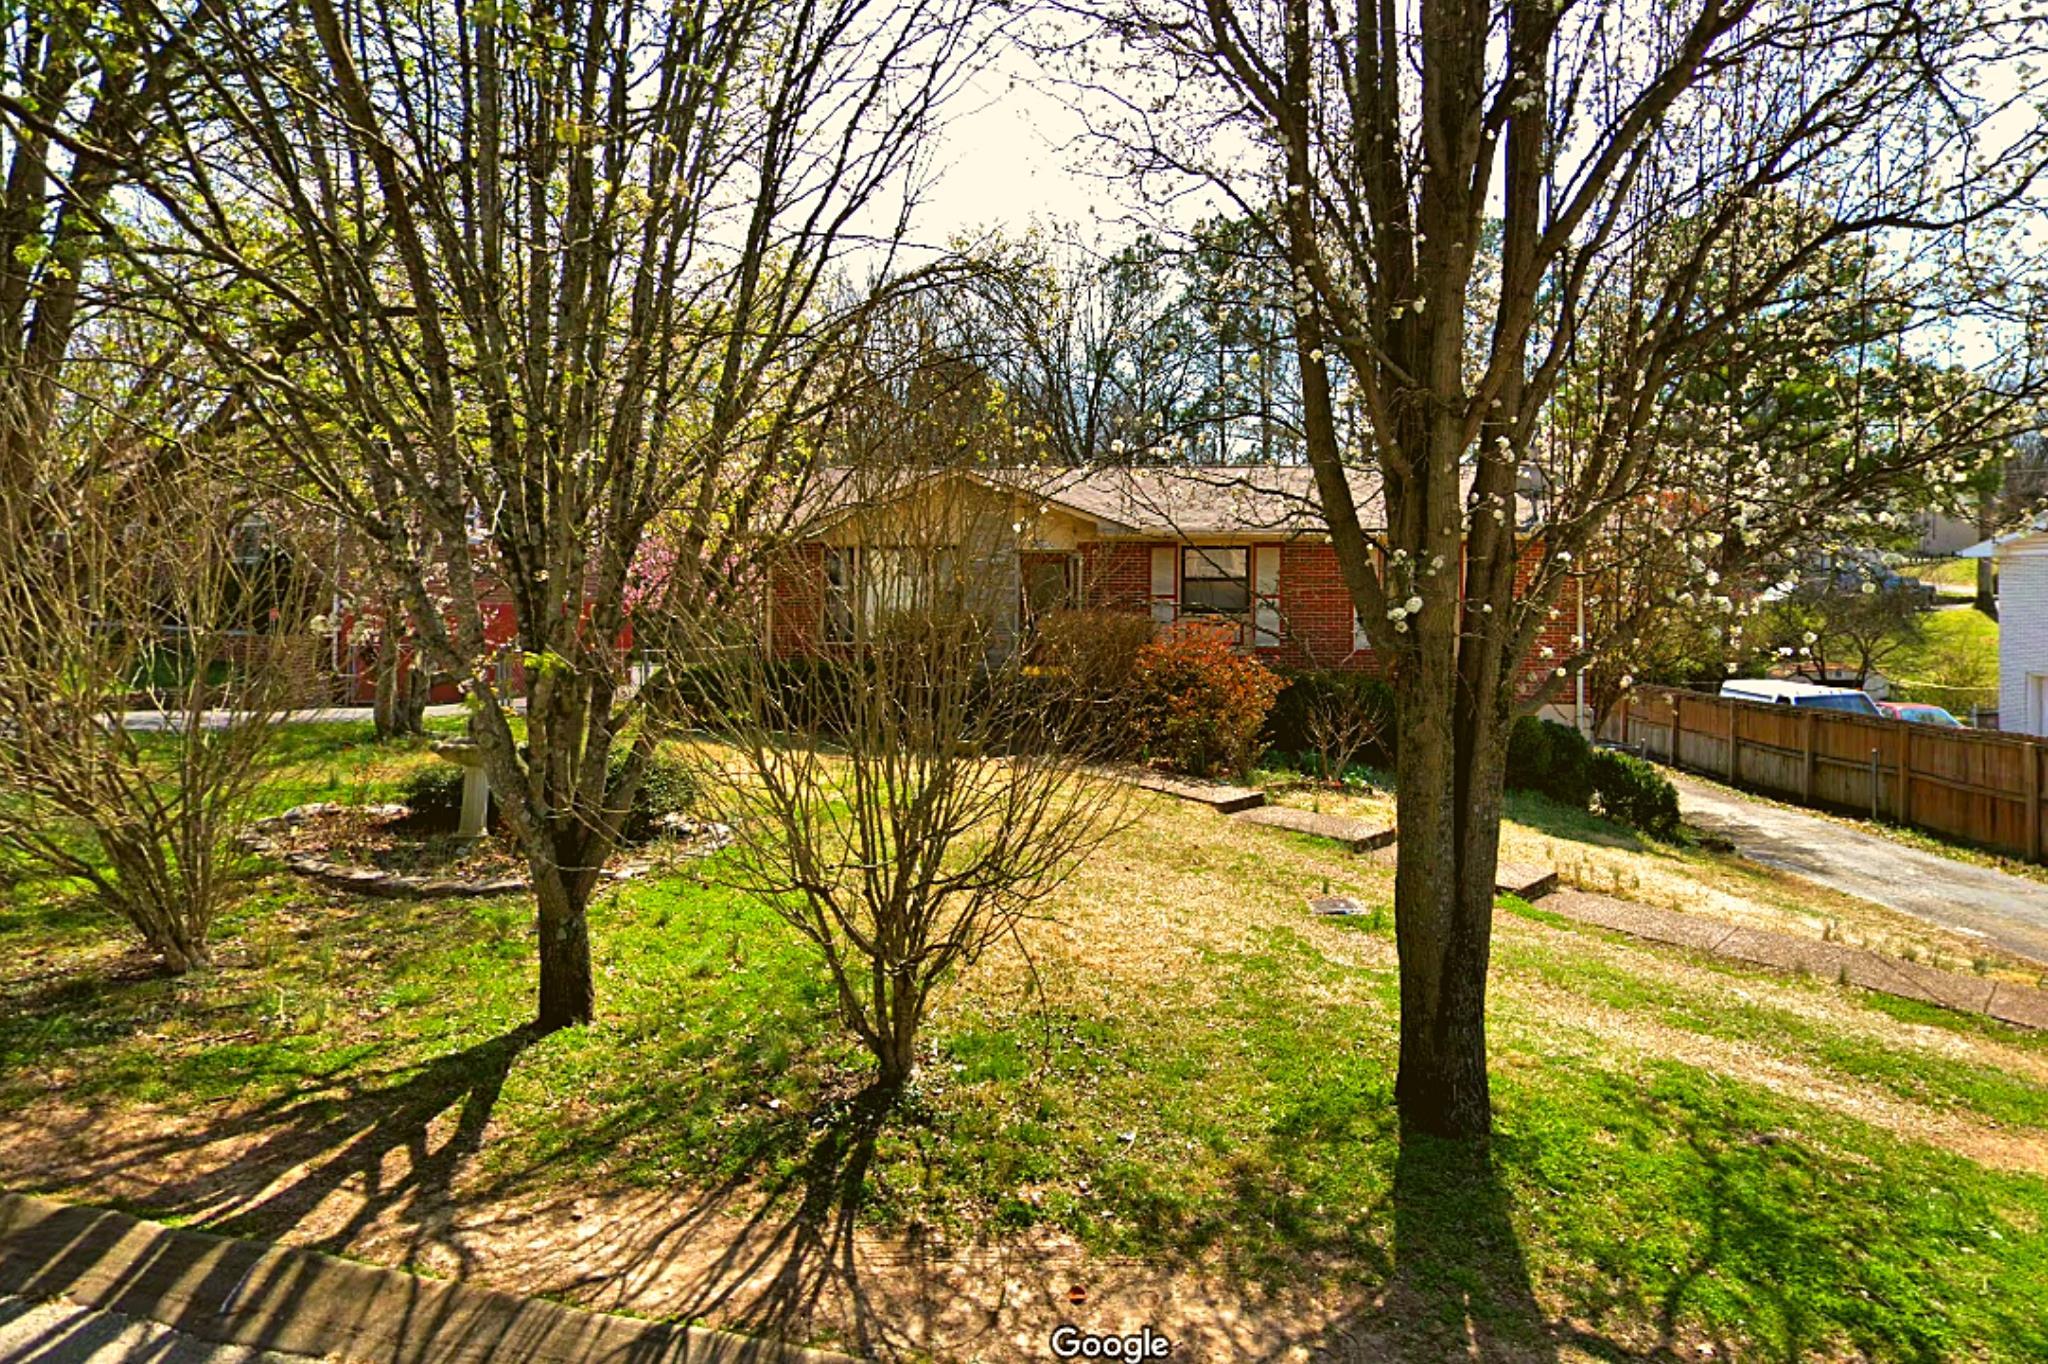 125 Denise Dr, Antioch, TN 37013 - Antioch, TN real estate listing